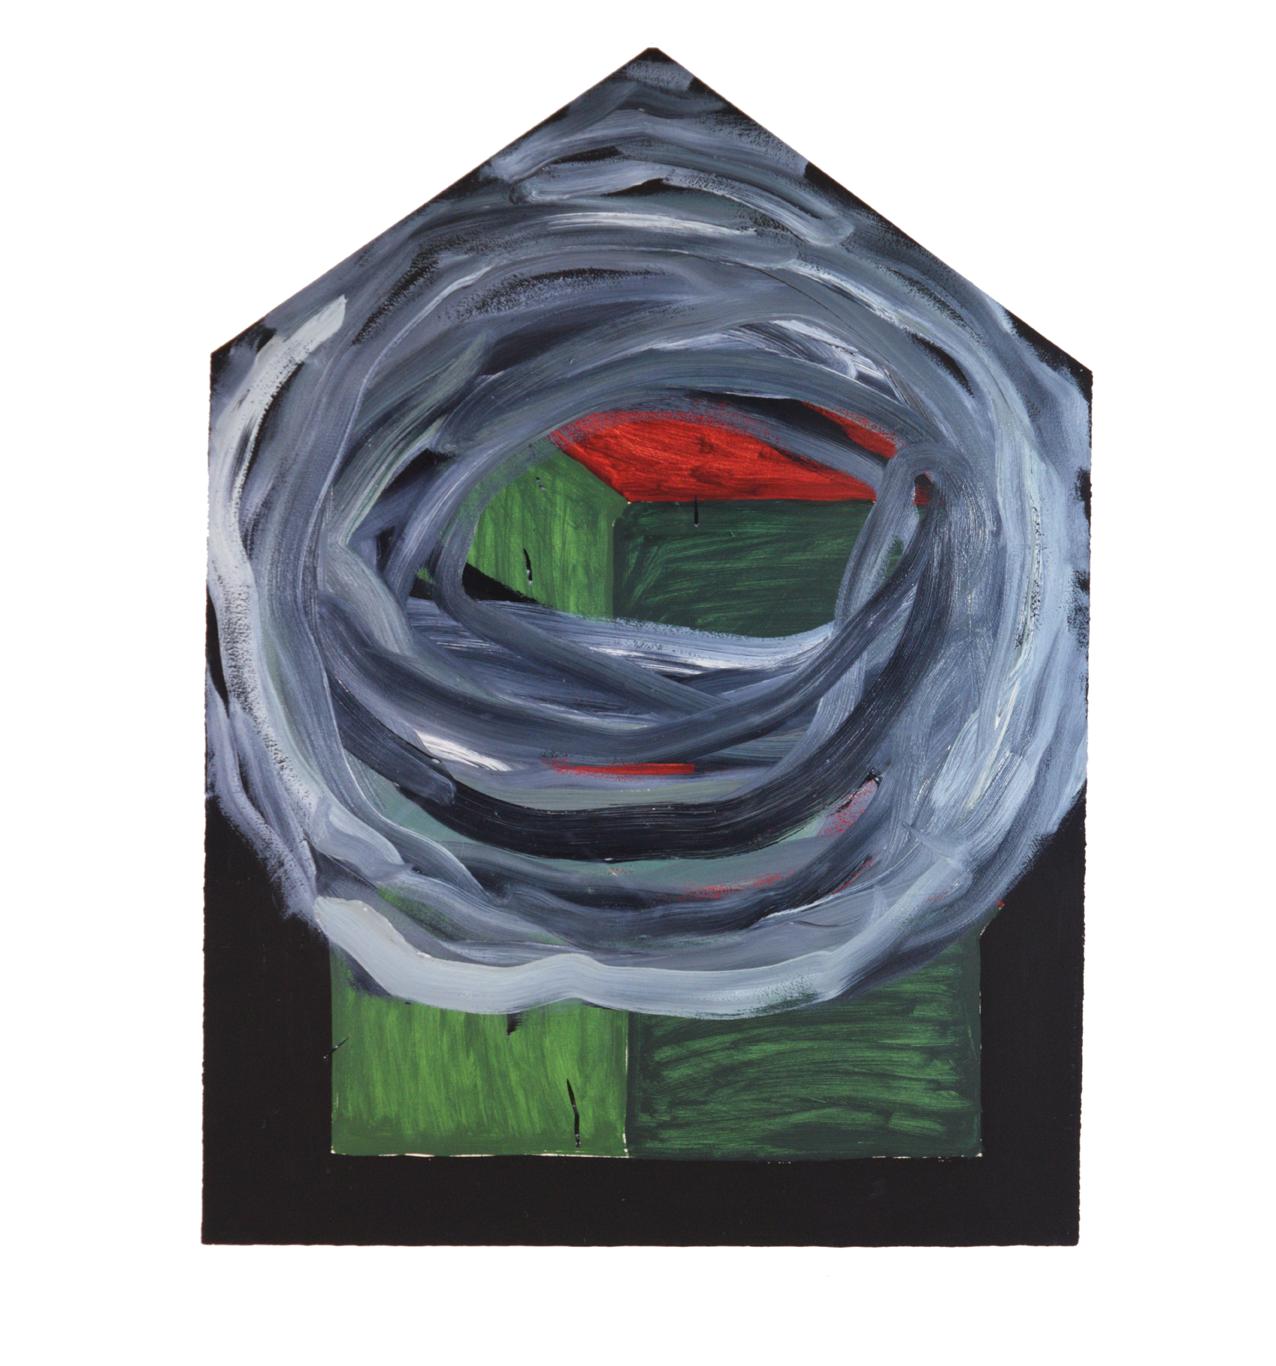 """Doppelhaus kreisförmig übermalt grau"" 1981, Öl auf Papier, 106 x 79 cm  - Foto Hadler/Stuhr"